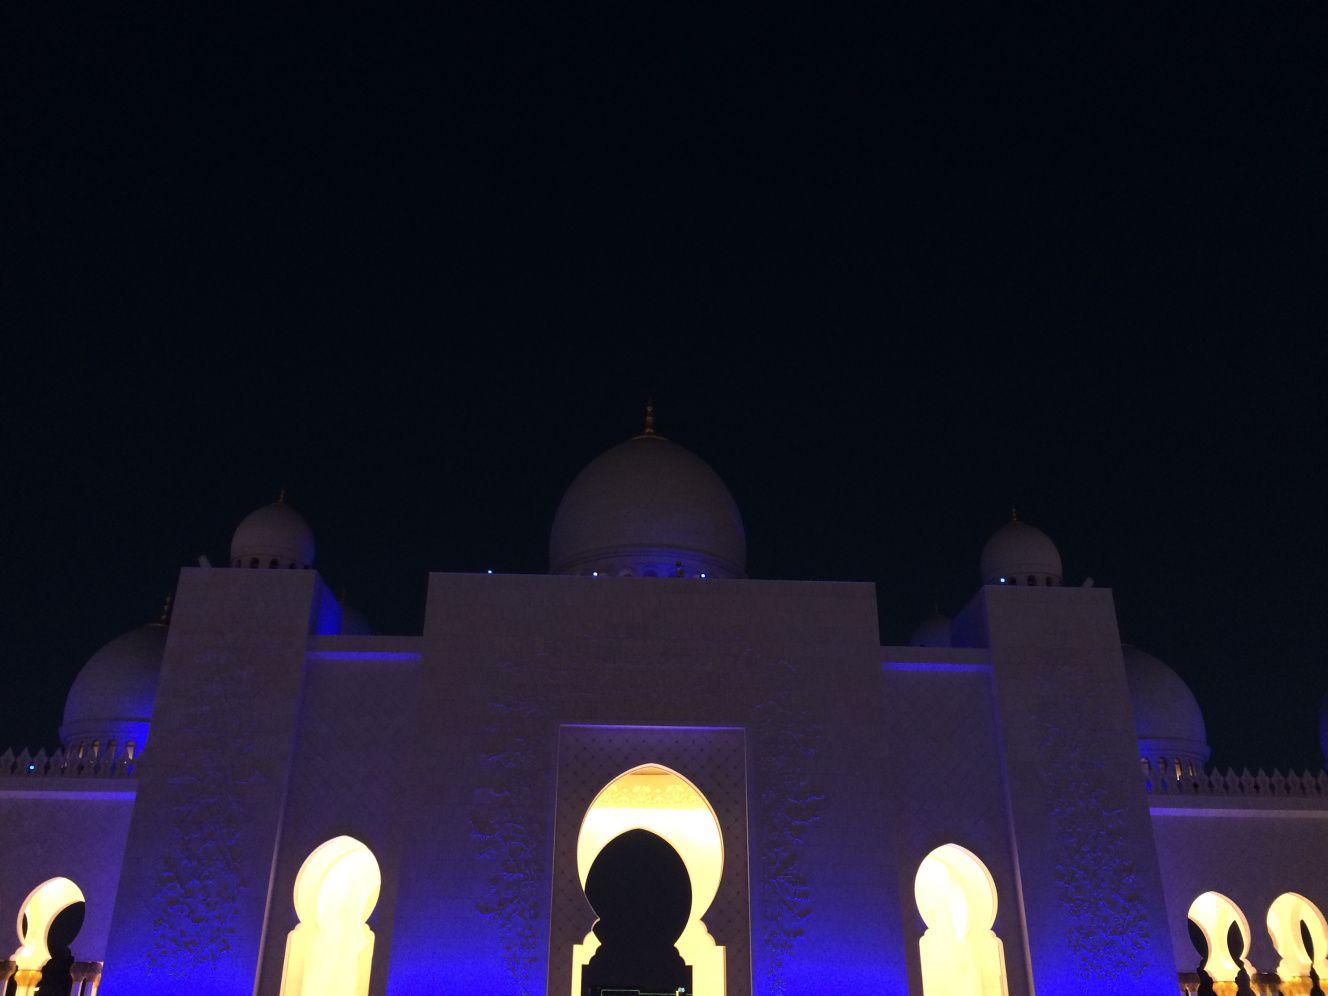 Night Time, Sheikh Zayed Grand Mosque, Abu Dhabi, UAE